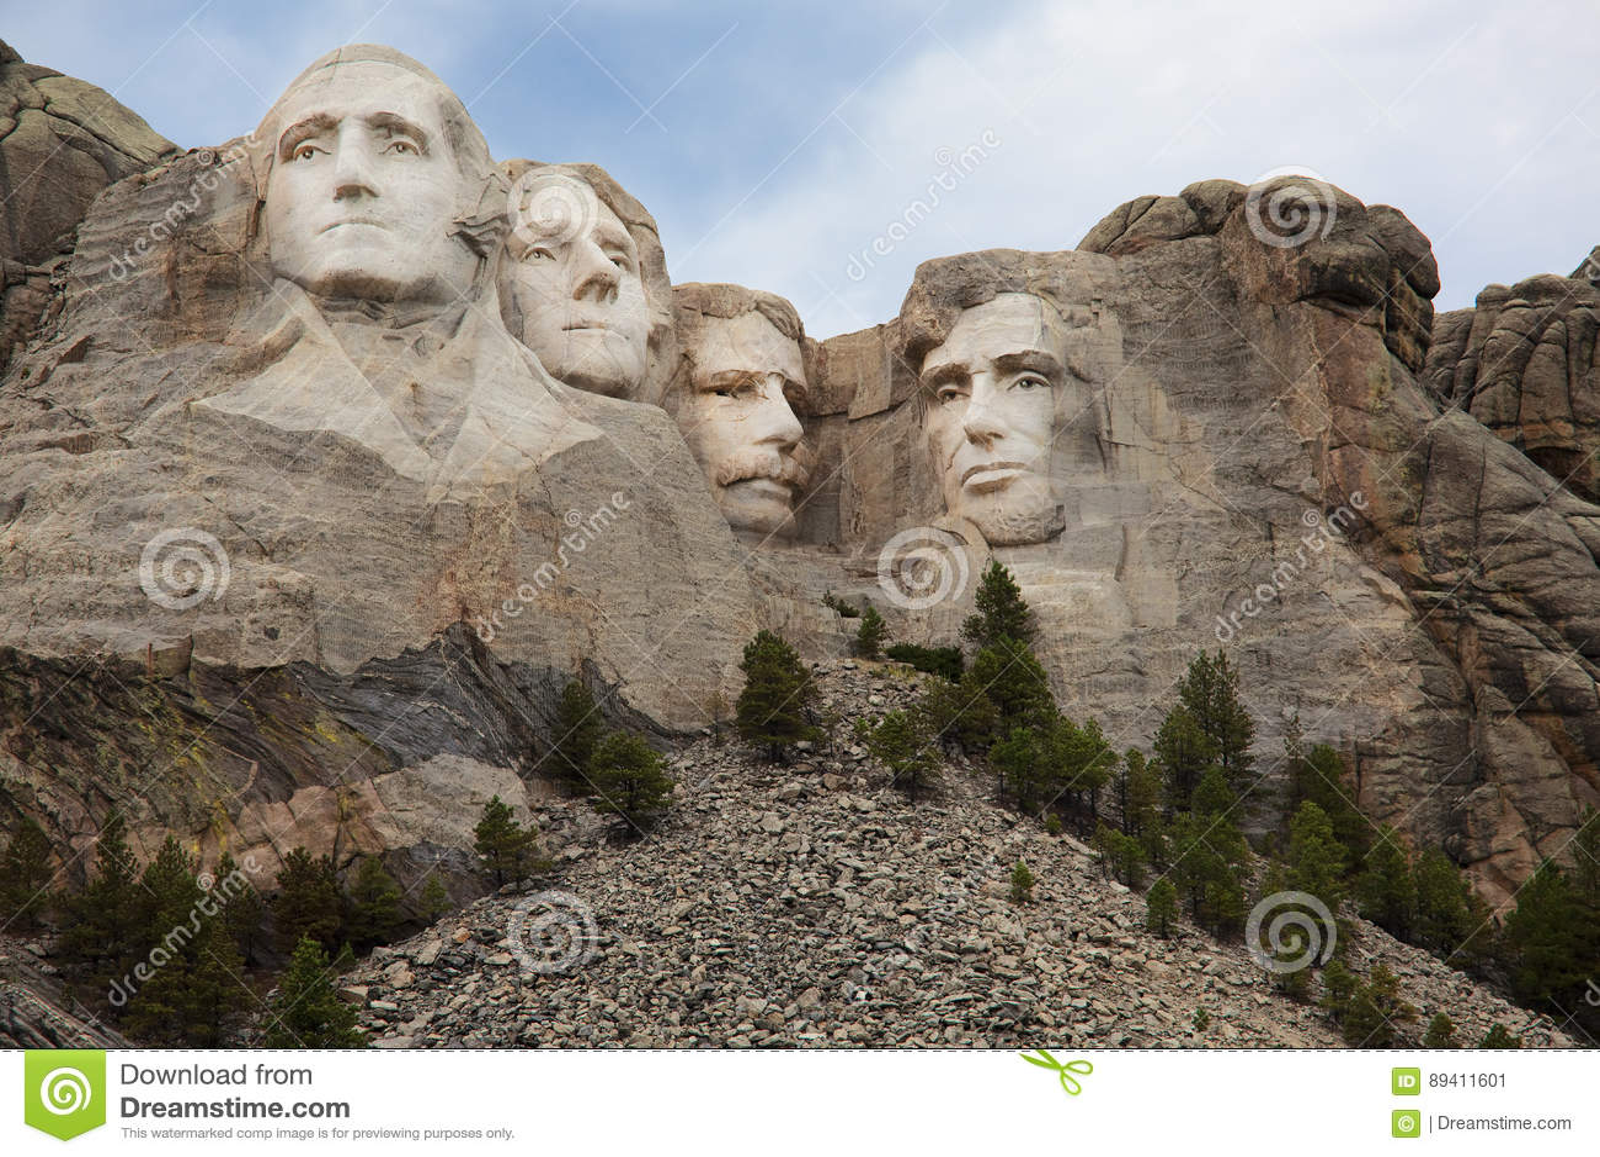 Mount Rushmore Black Hills, South Dakota